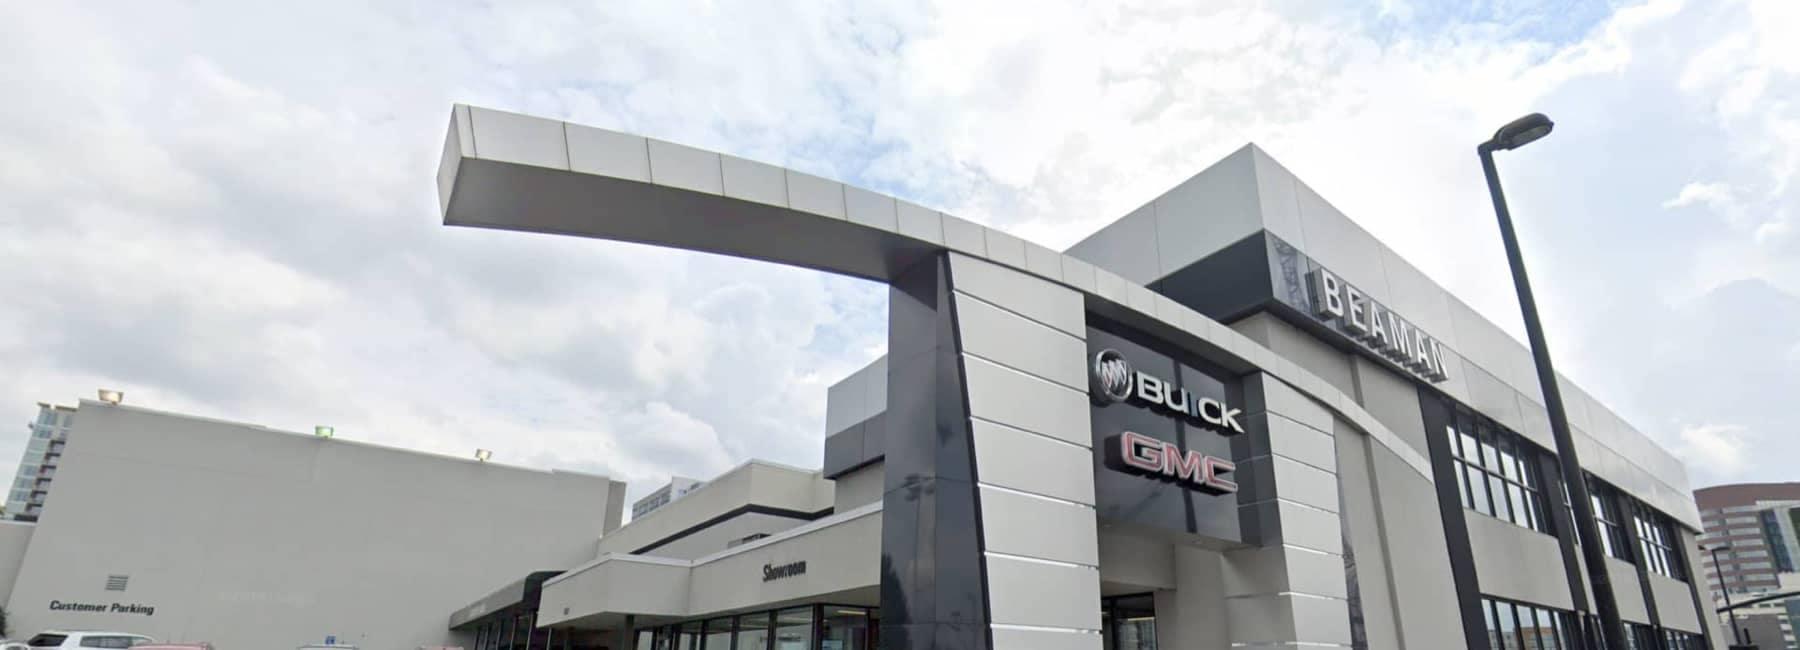 Beaman Buick GMC Dealership